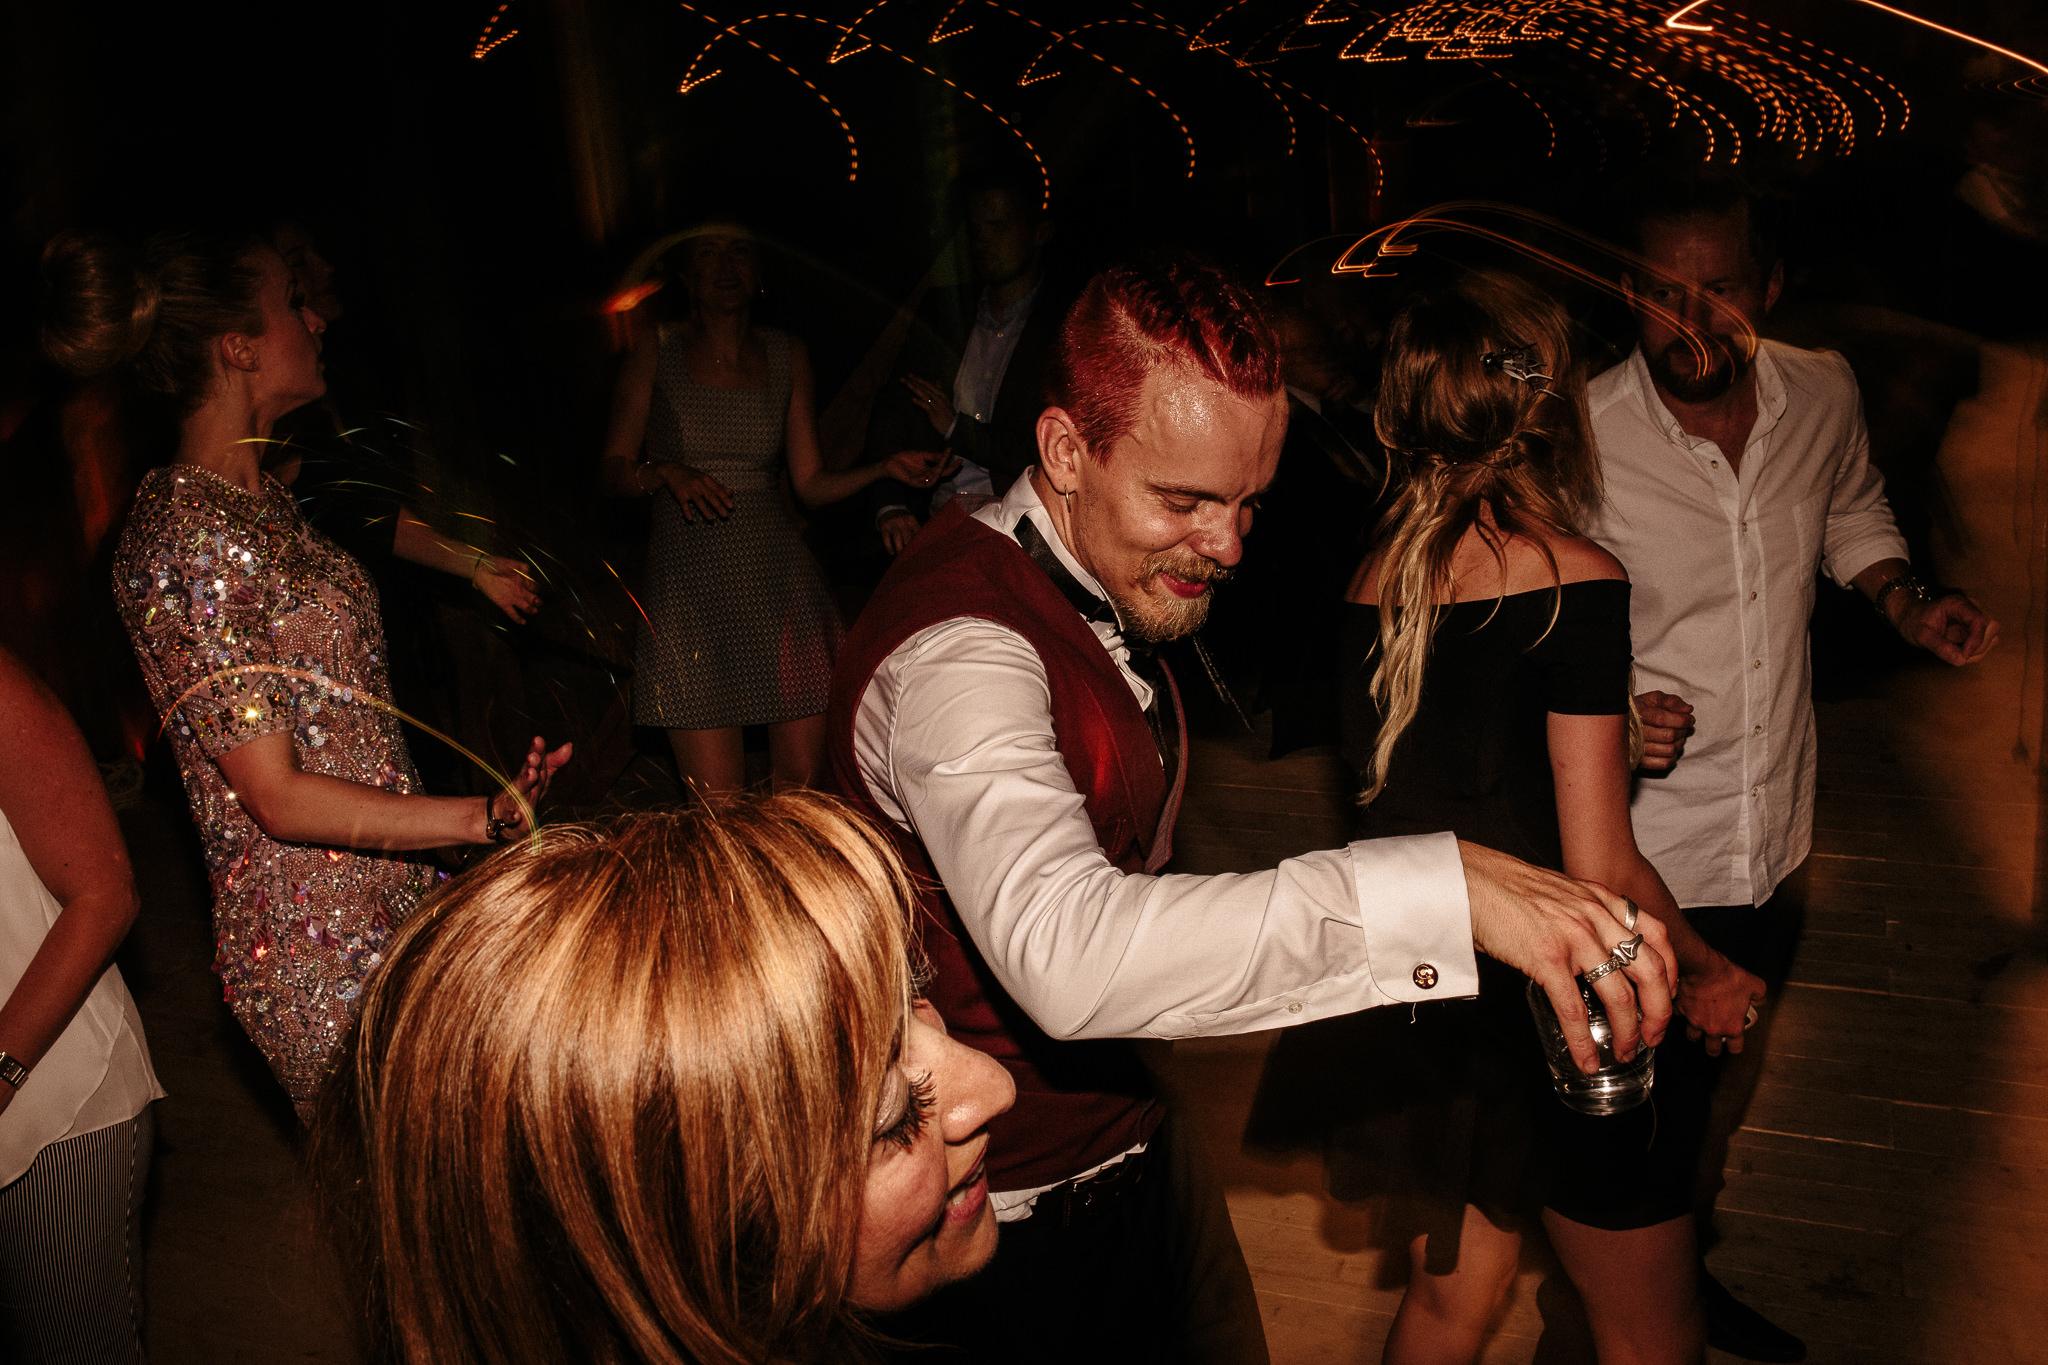 Ceren & Jani - Finland Wedding Photographer - Weddings by Qay - Wedding Photographer (160 of 166).jpg